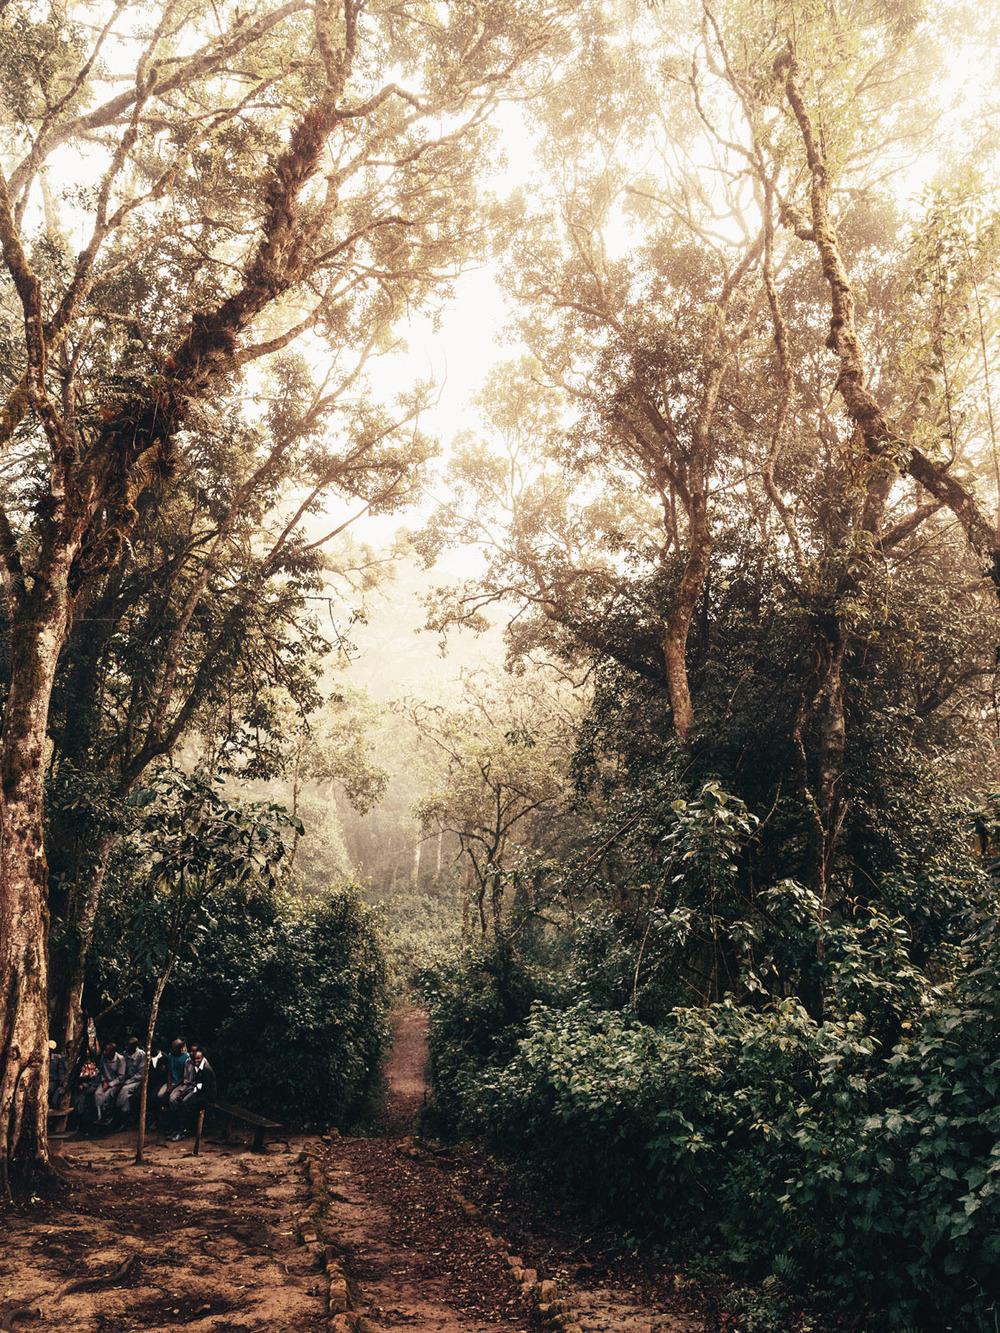 CallieGiovanna_Africa_Uganda_BwindiImpenetrableForest_20150101_09214.jpg